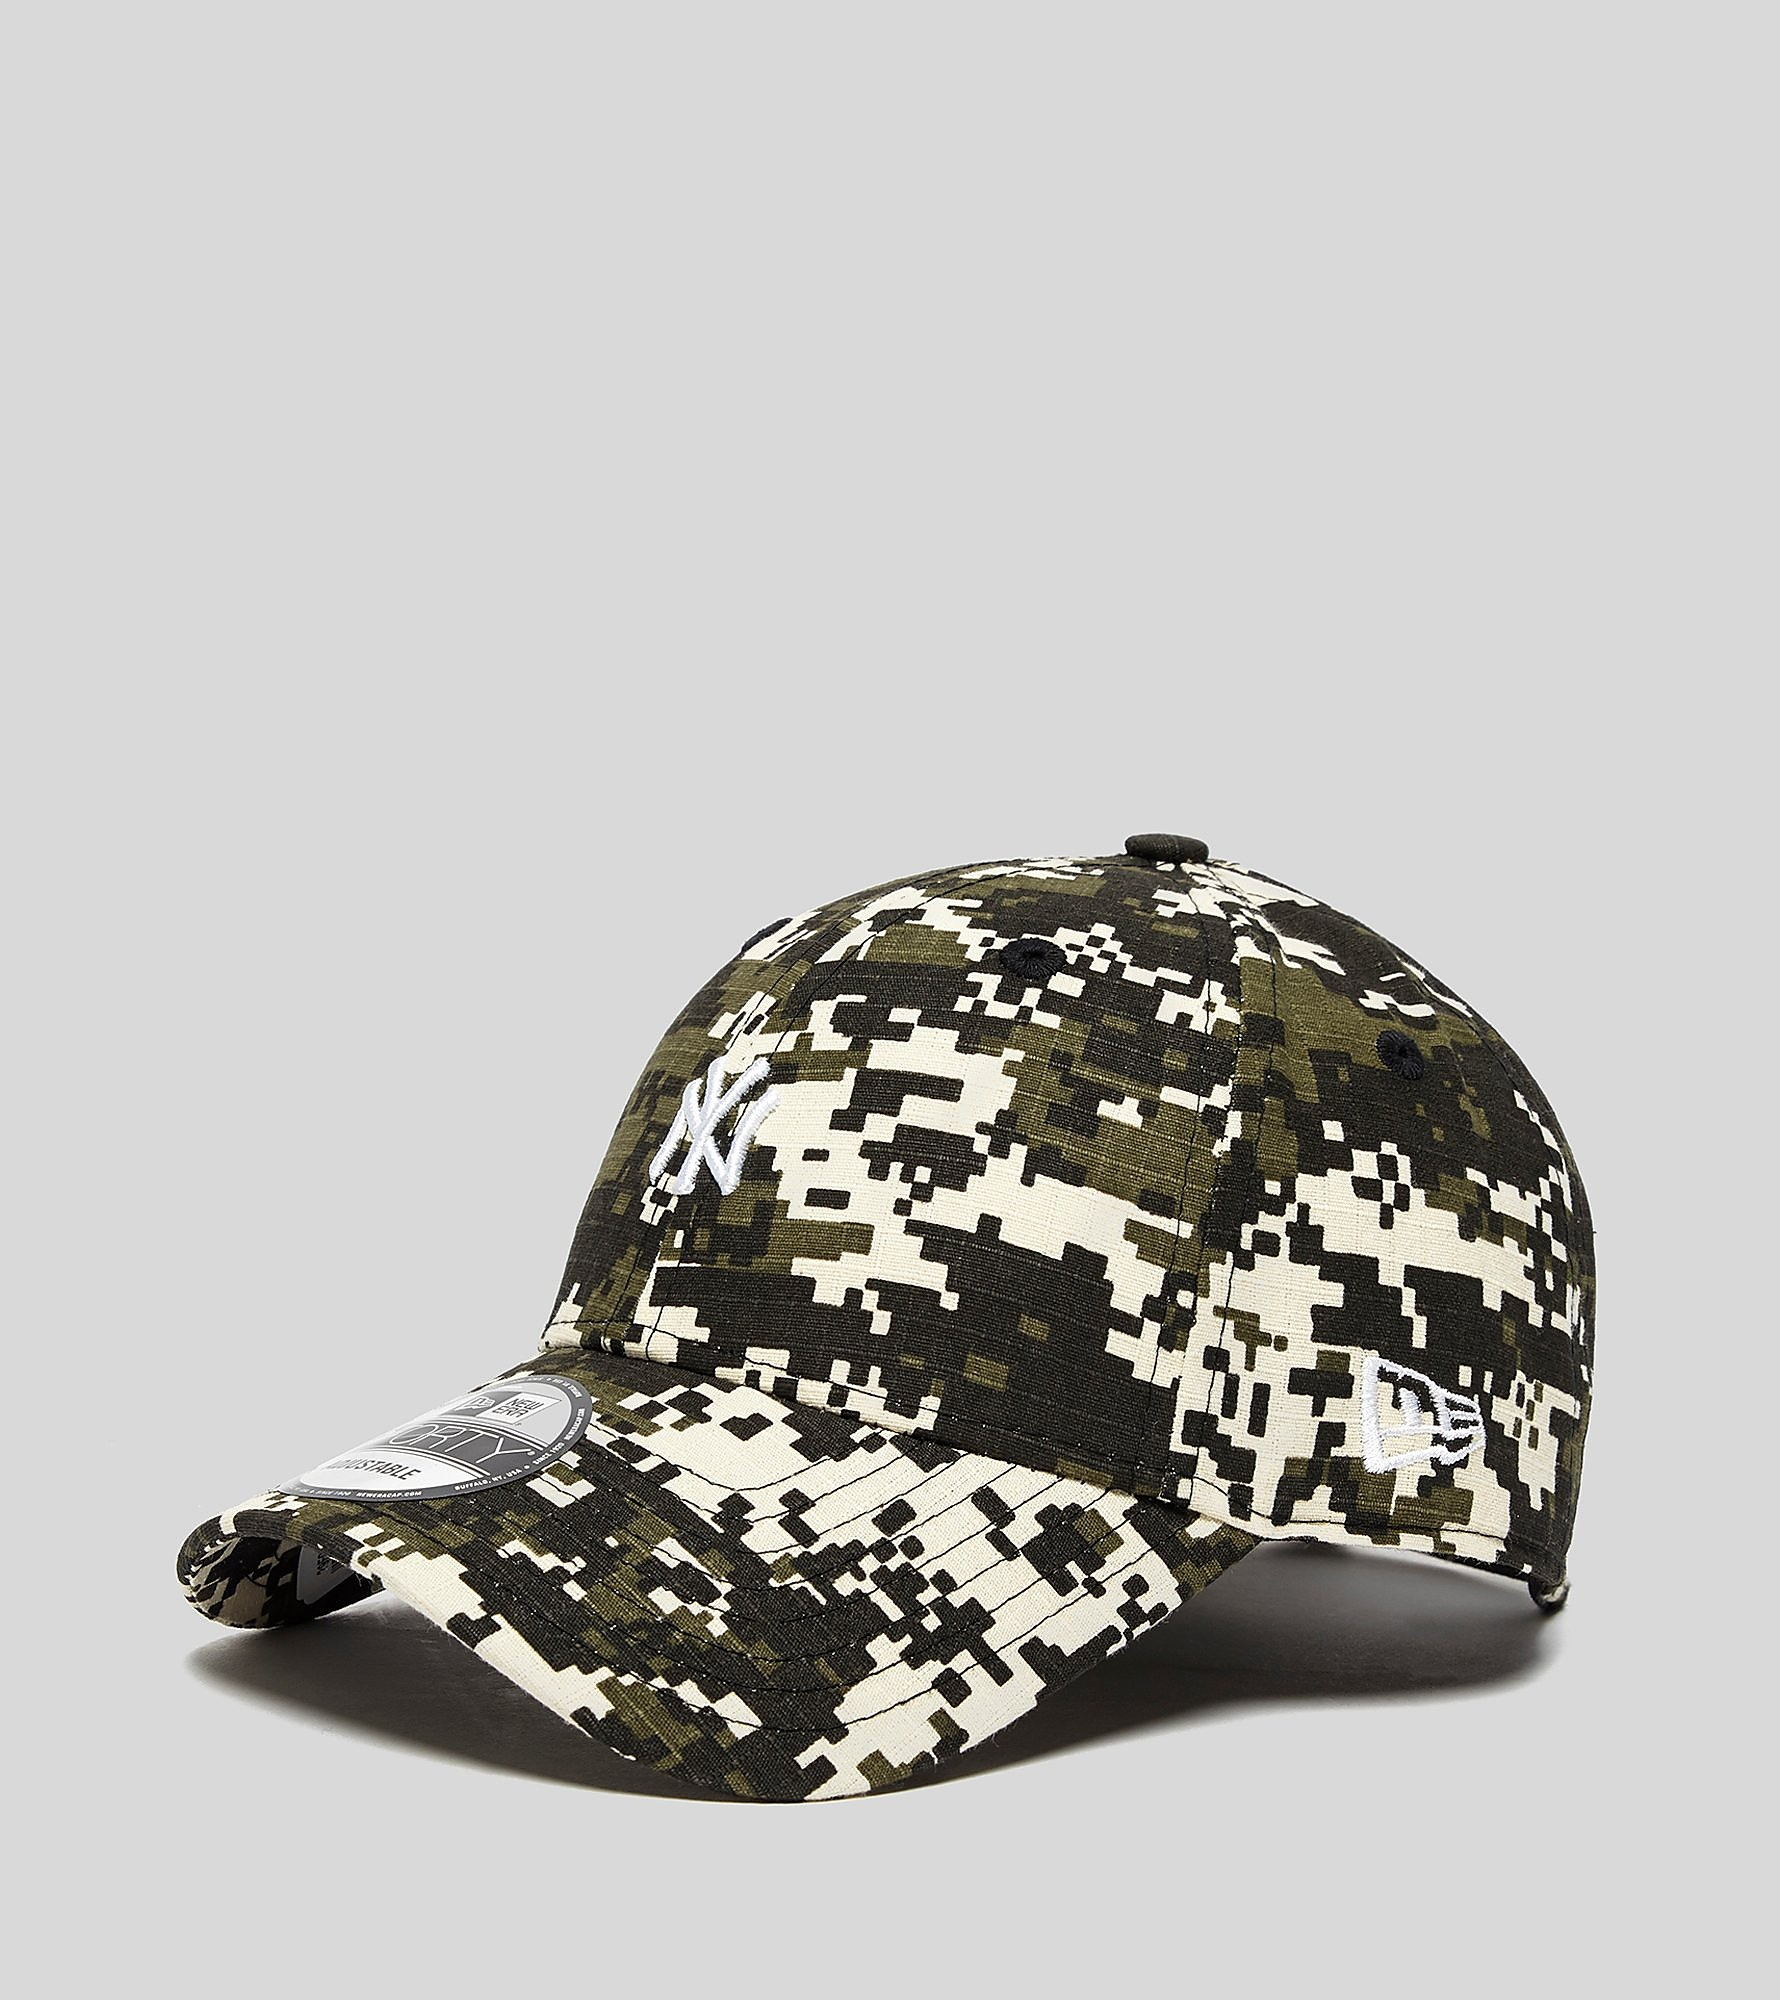 New Era 9FORTY New York Yankees Digi Cap - size? Exclusive